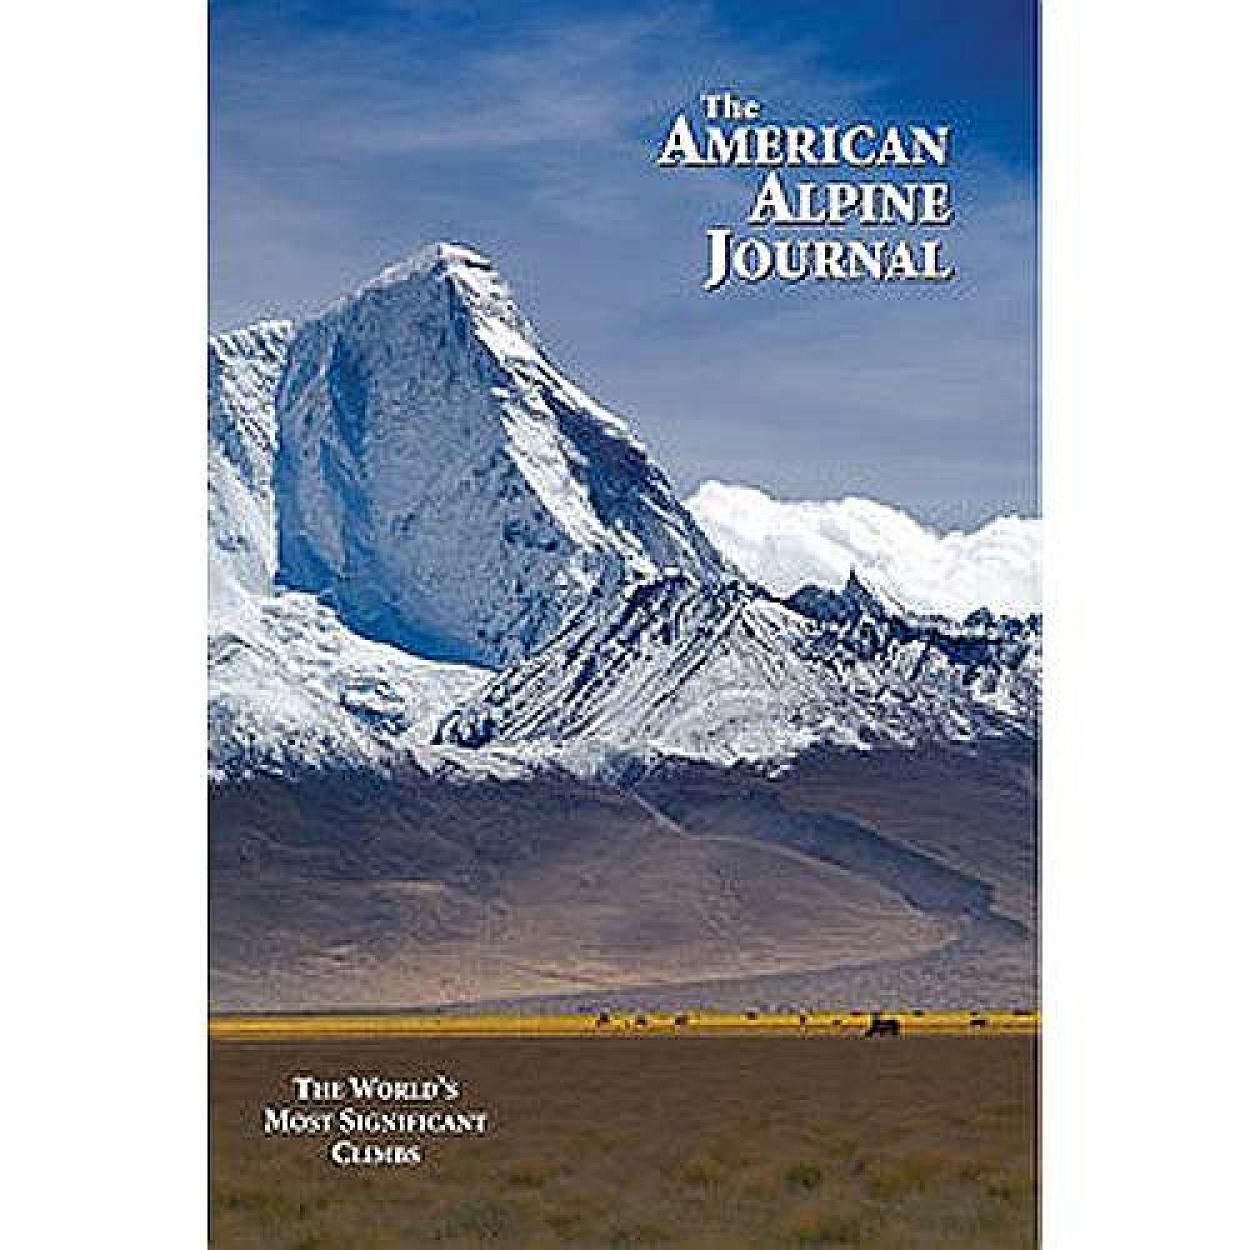 Image of American Alpine Journal 2007